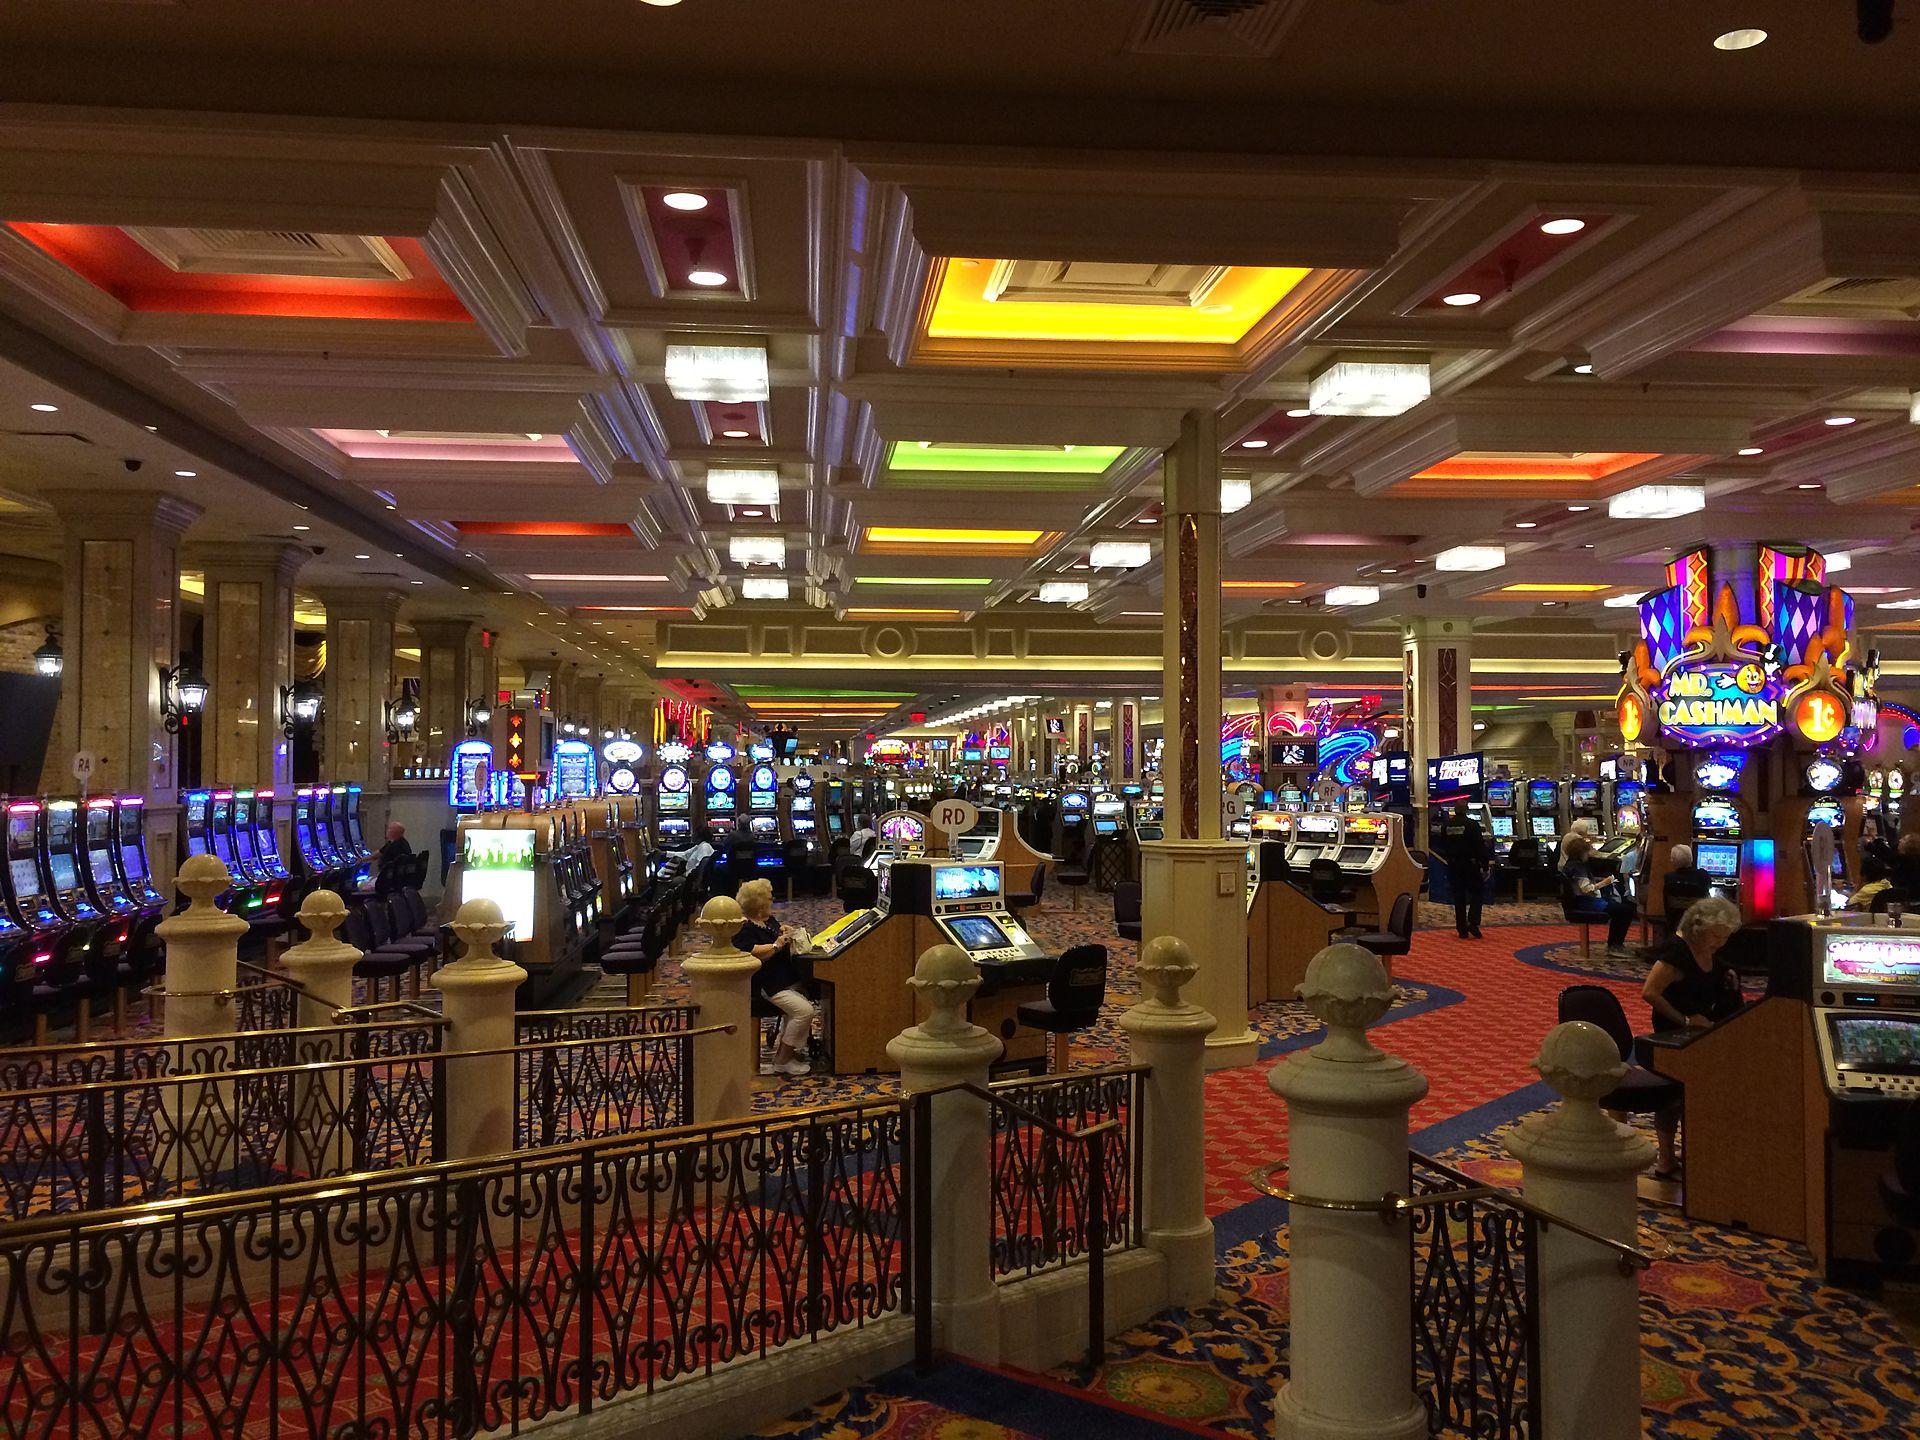 House of blues showboat casino atlantic city nj